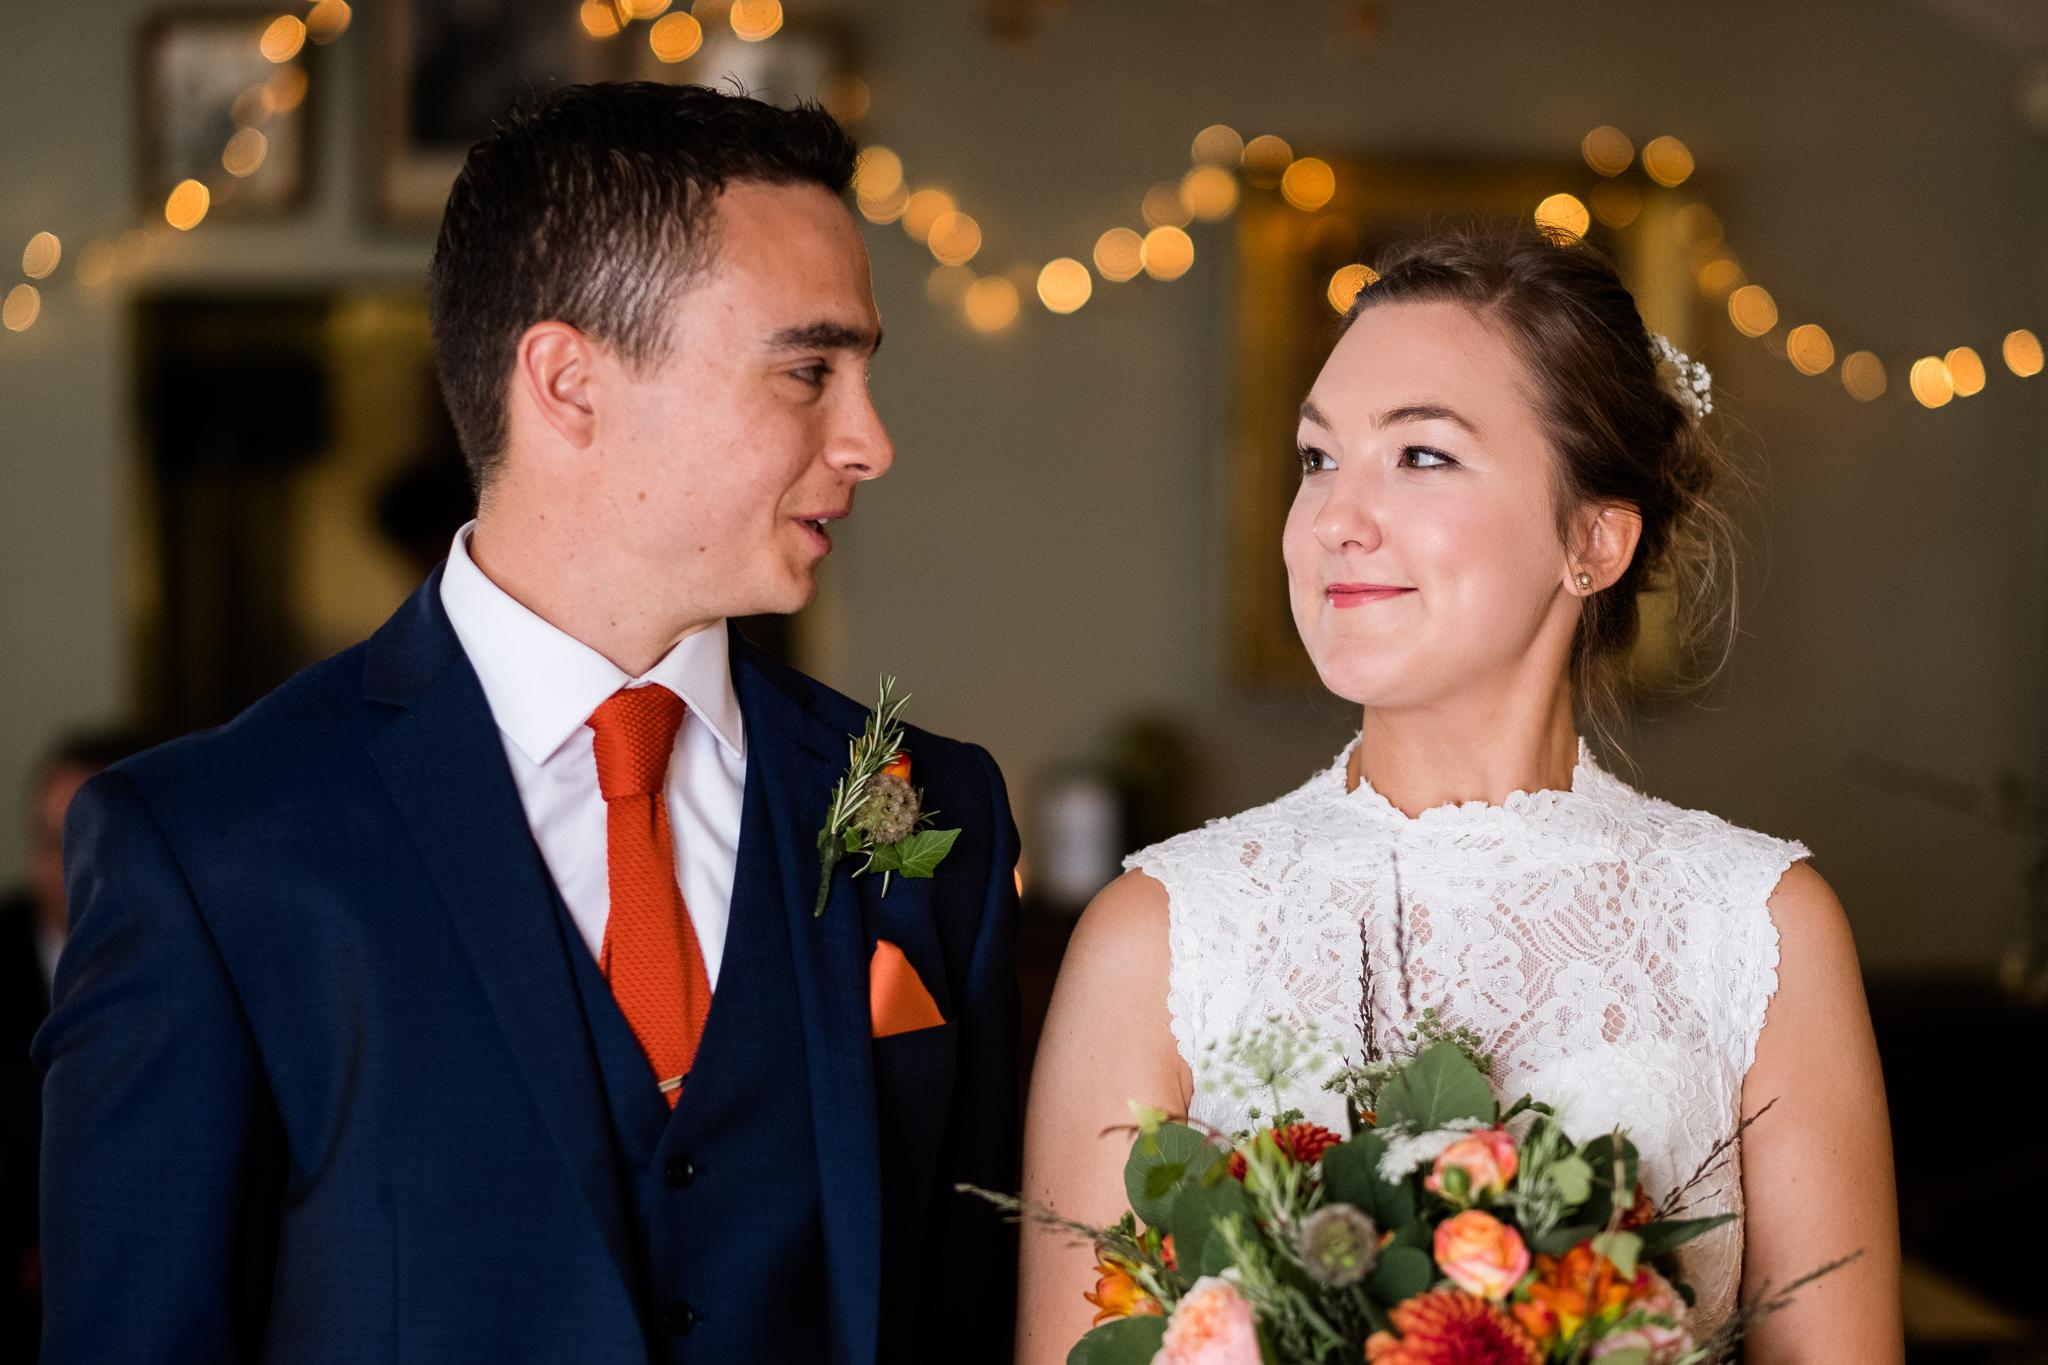 Relaxed Documentary Wedding Photography at The Wizard Inn, Alderley Edge Cheshire - Jenny Harper-24.jpg